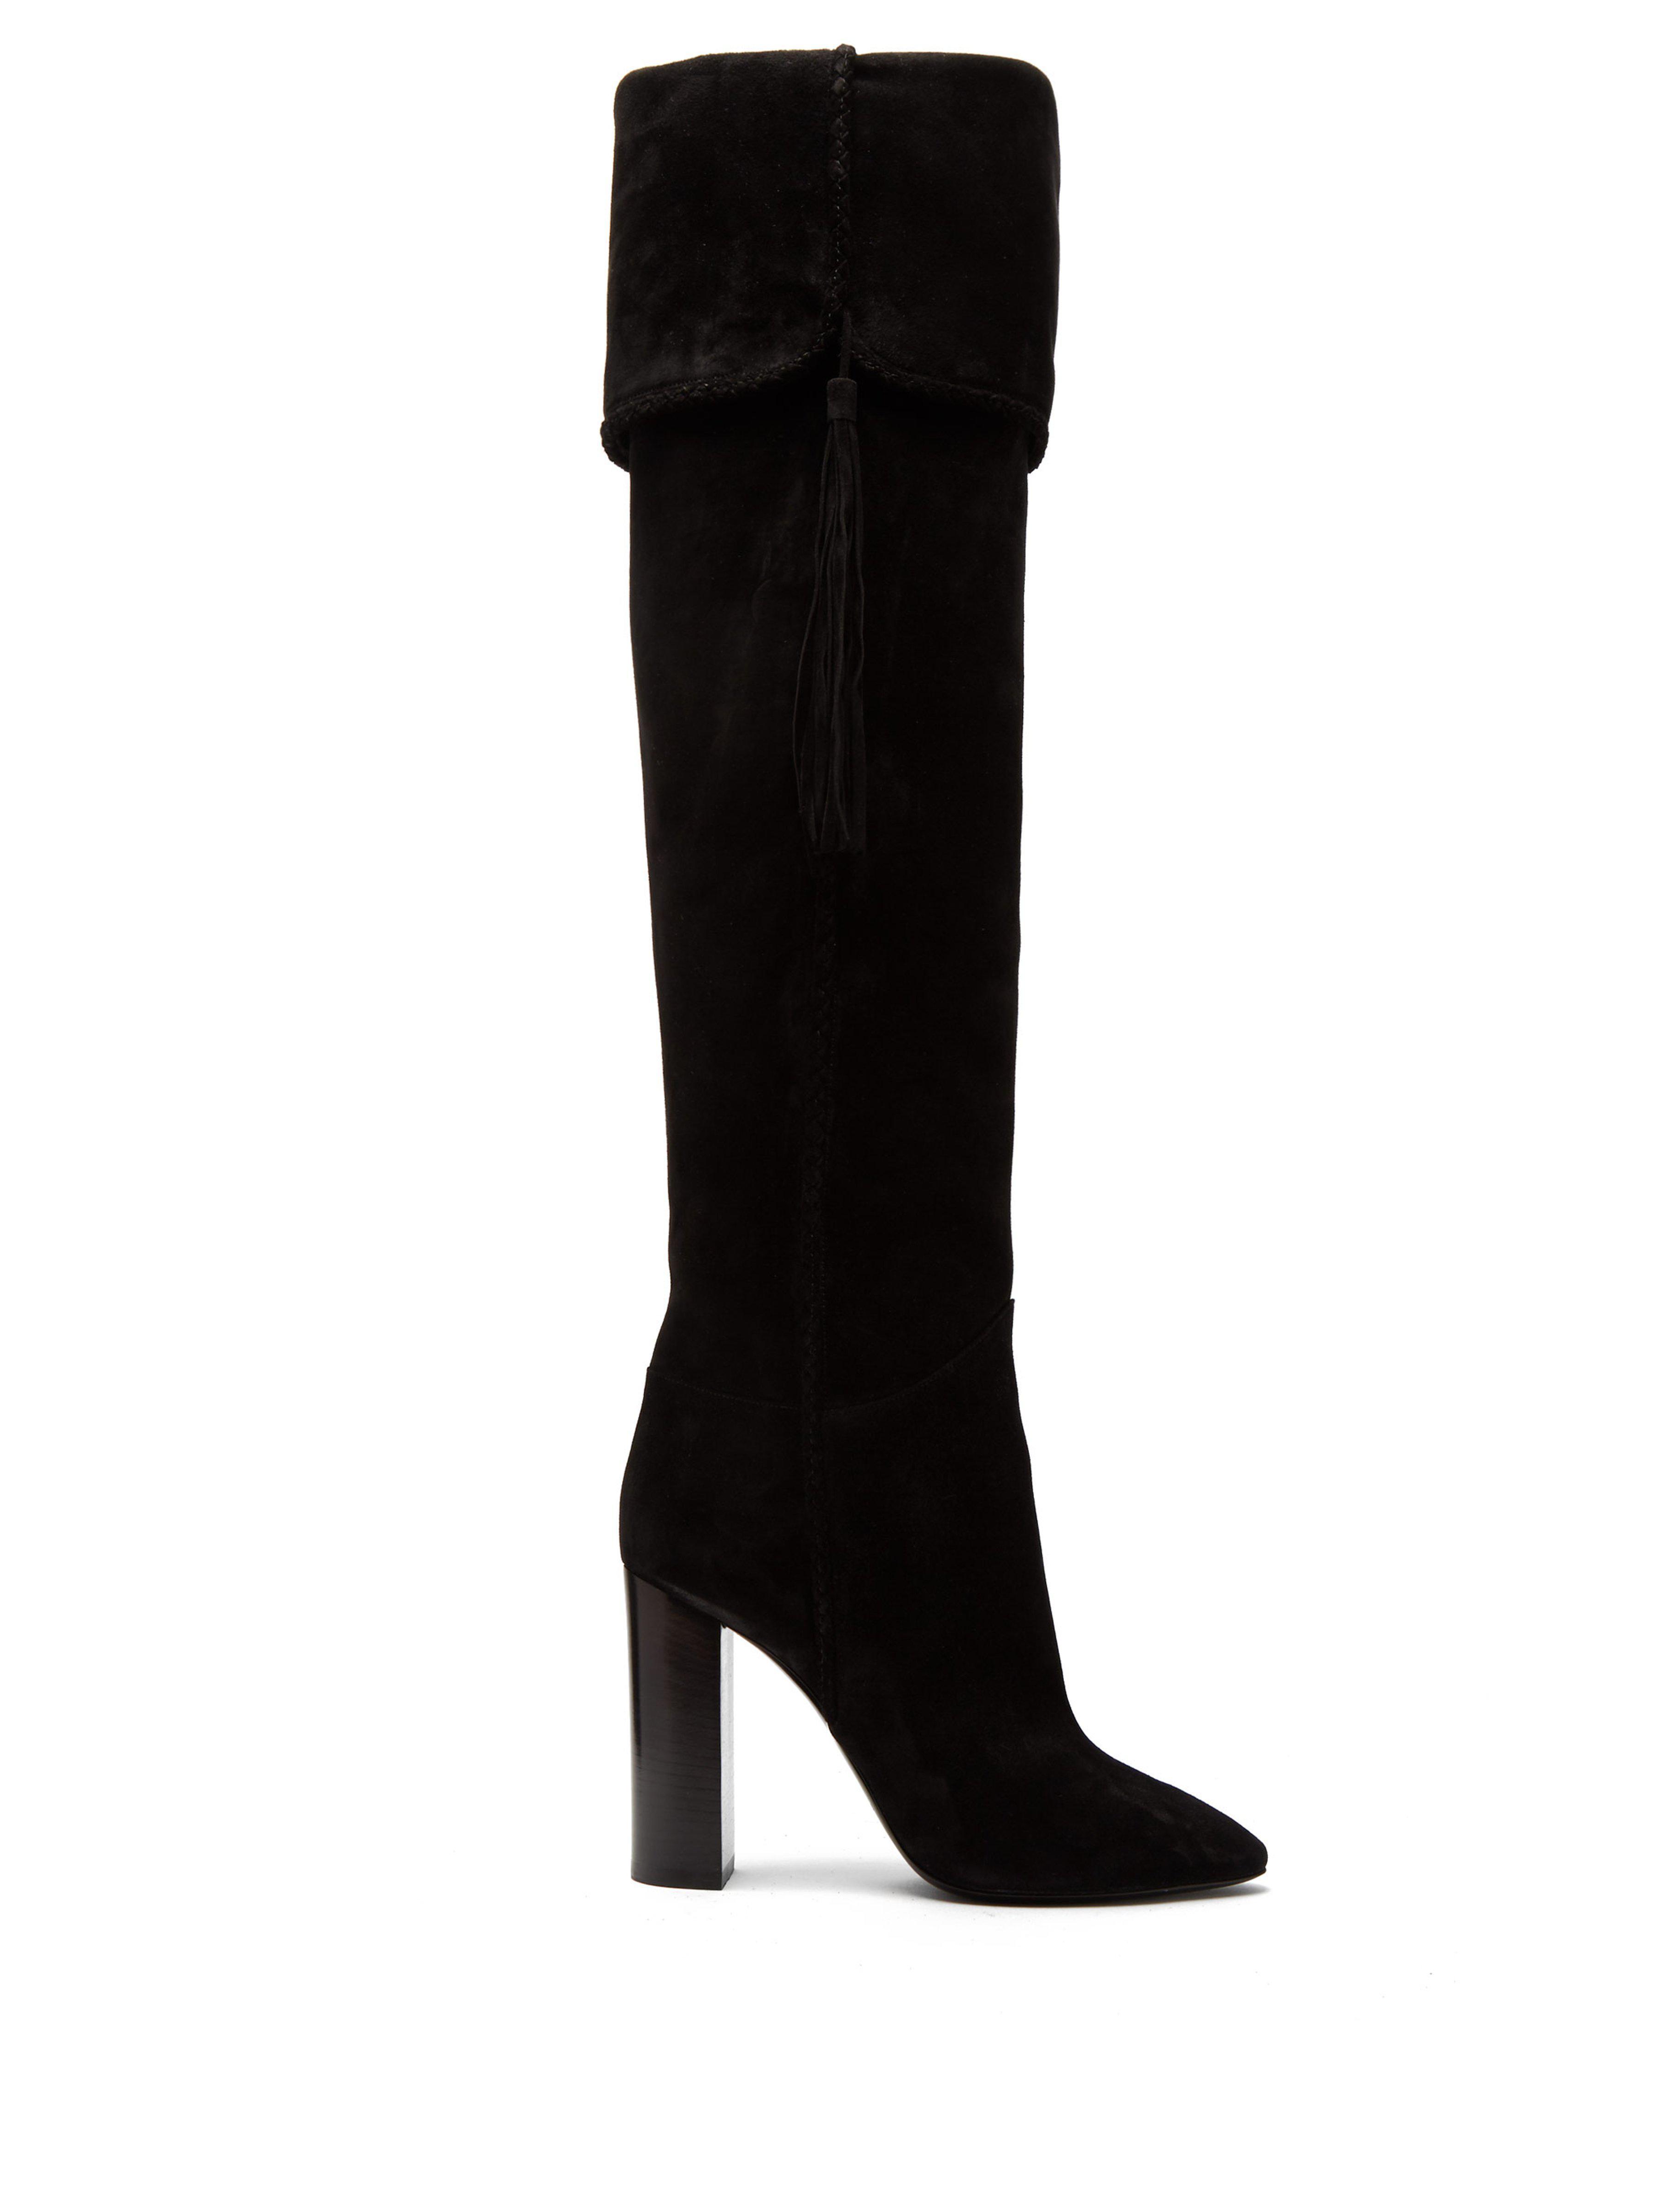 b003878530a Saint Laurent Meurice Tassel Embellished Suede Boots in Black - Save ...